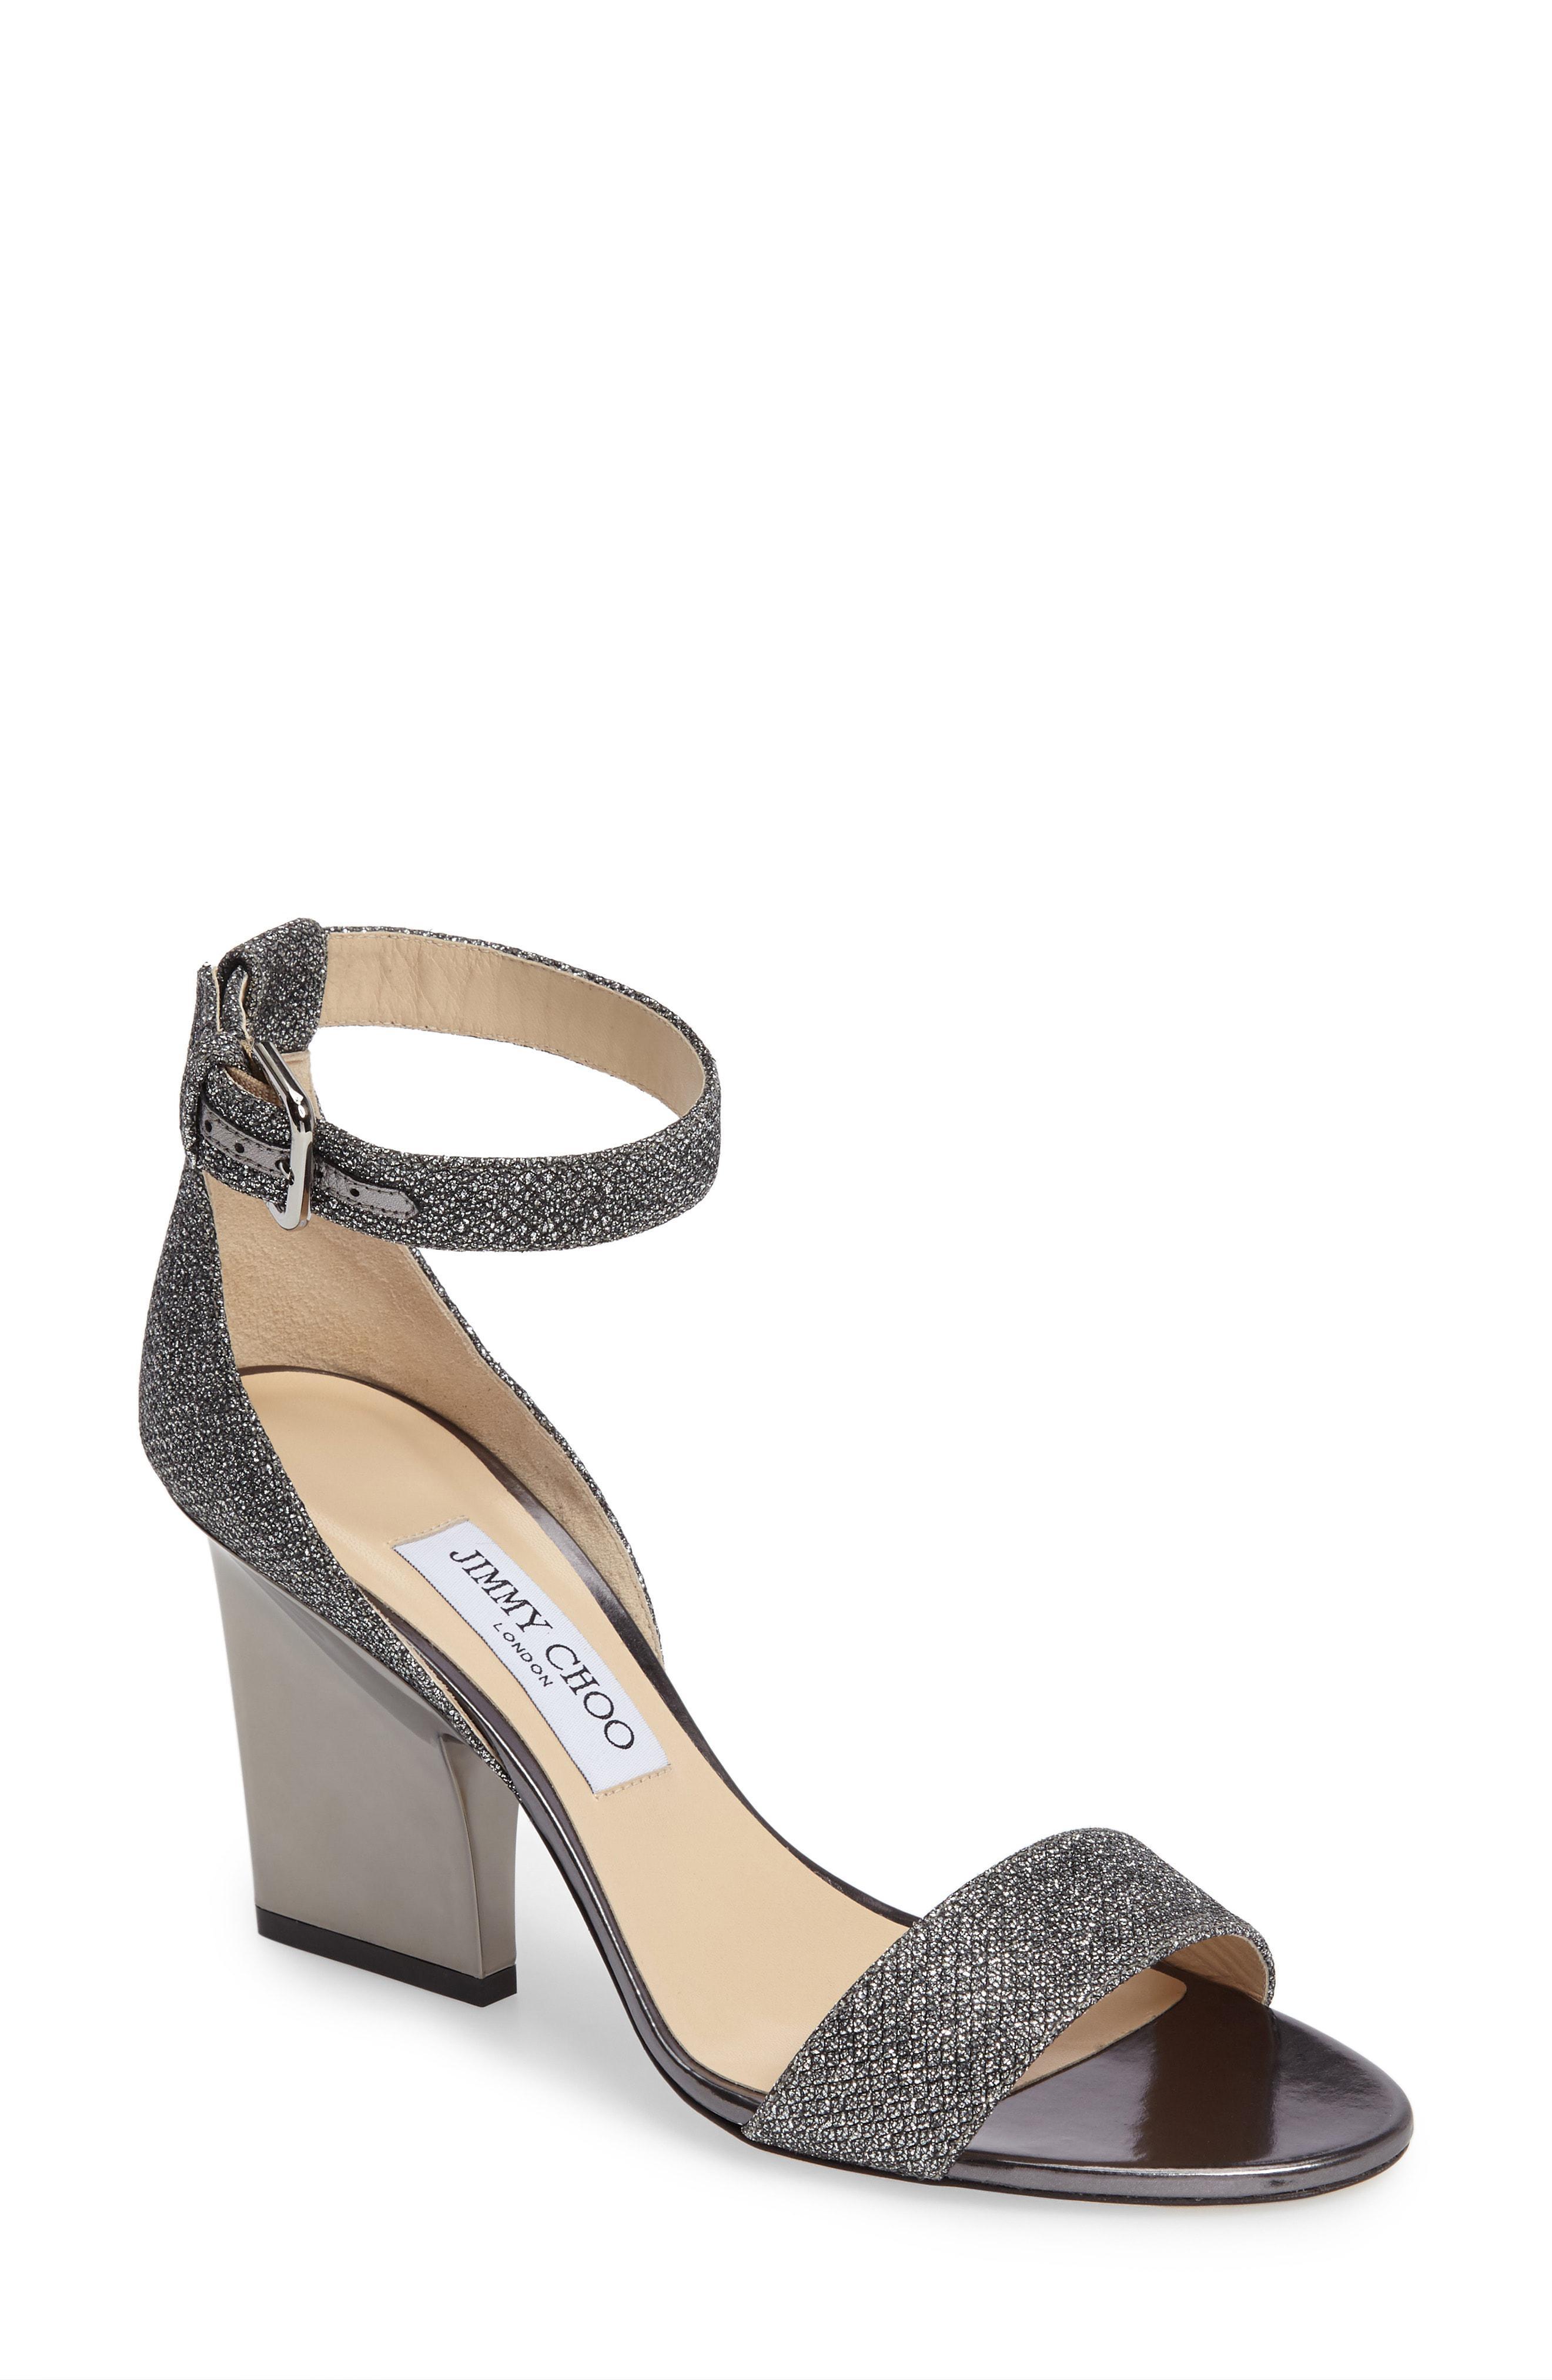 5b4c7bbb955 Lyst - Jimmy Choo Edina Ankle Strap Sandal